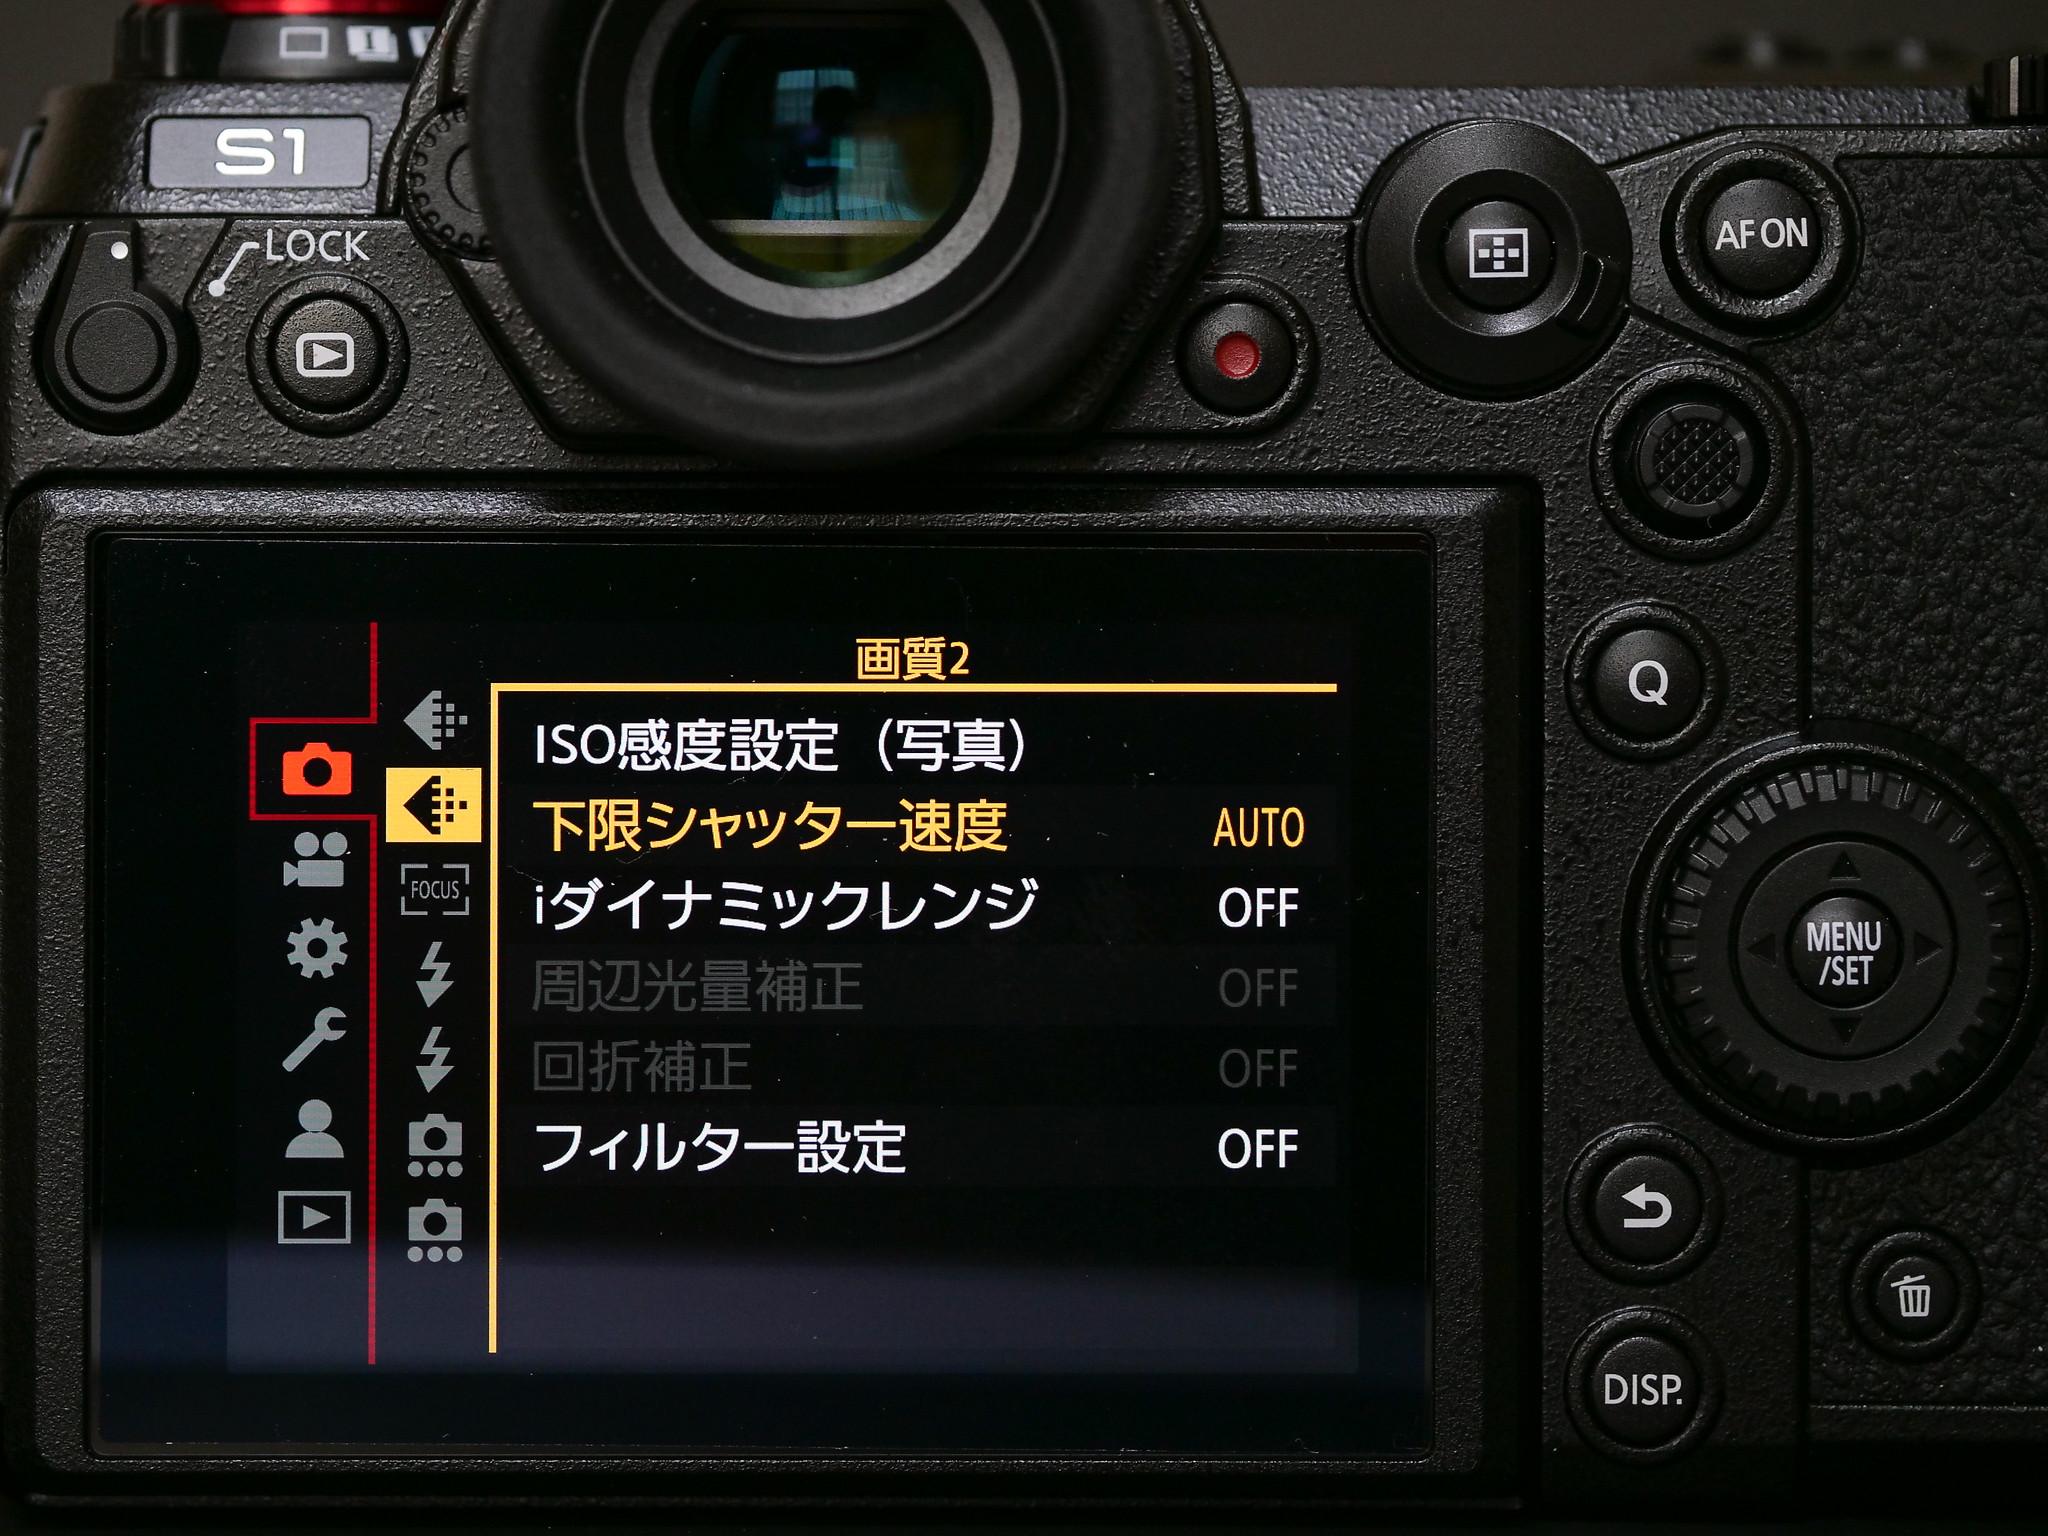 P1279185.jpg